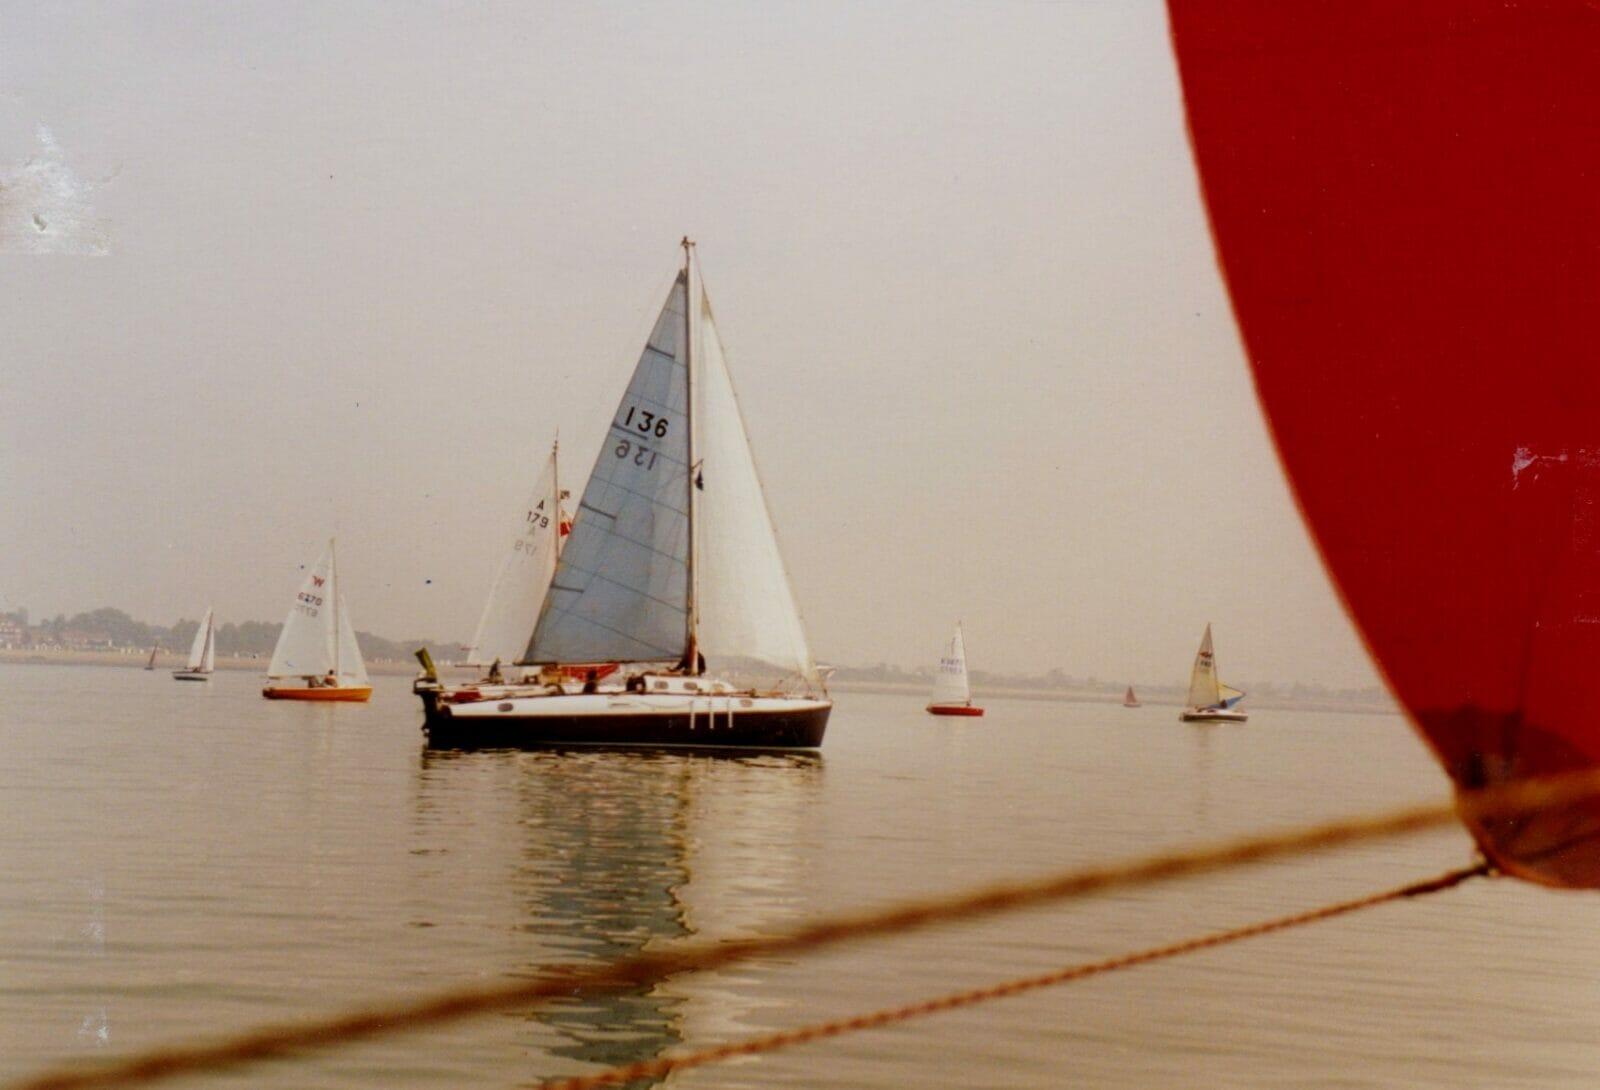 Two Atalantas in light airs at West Mersea